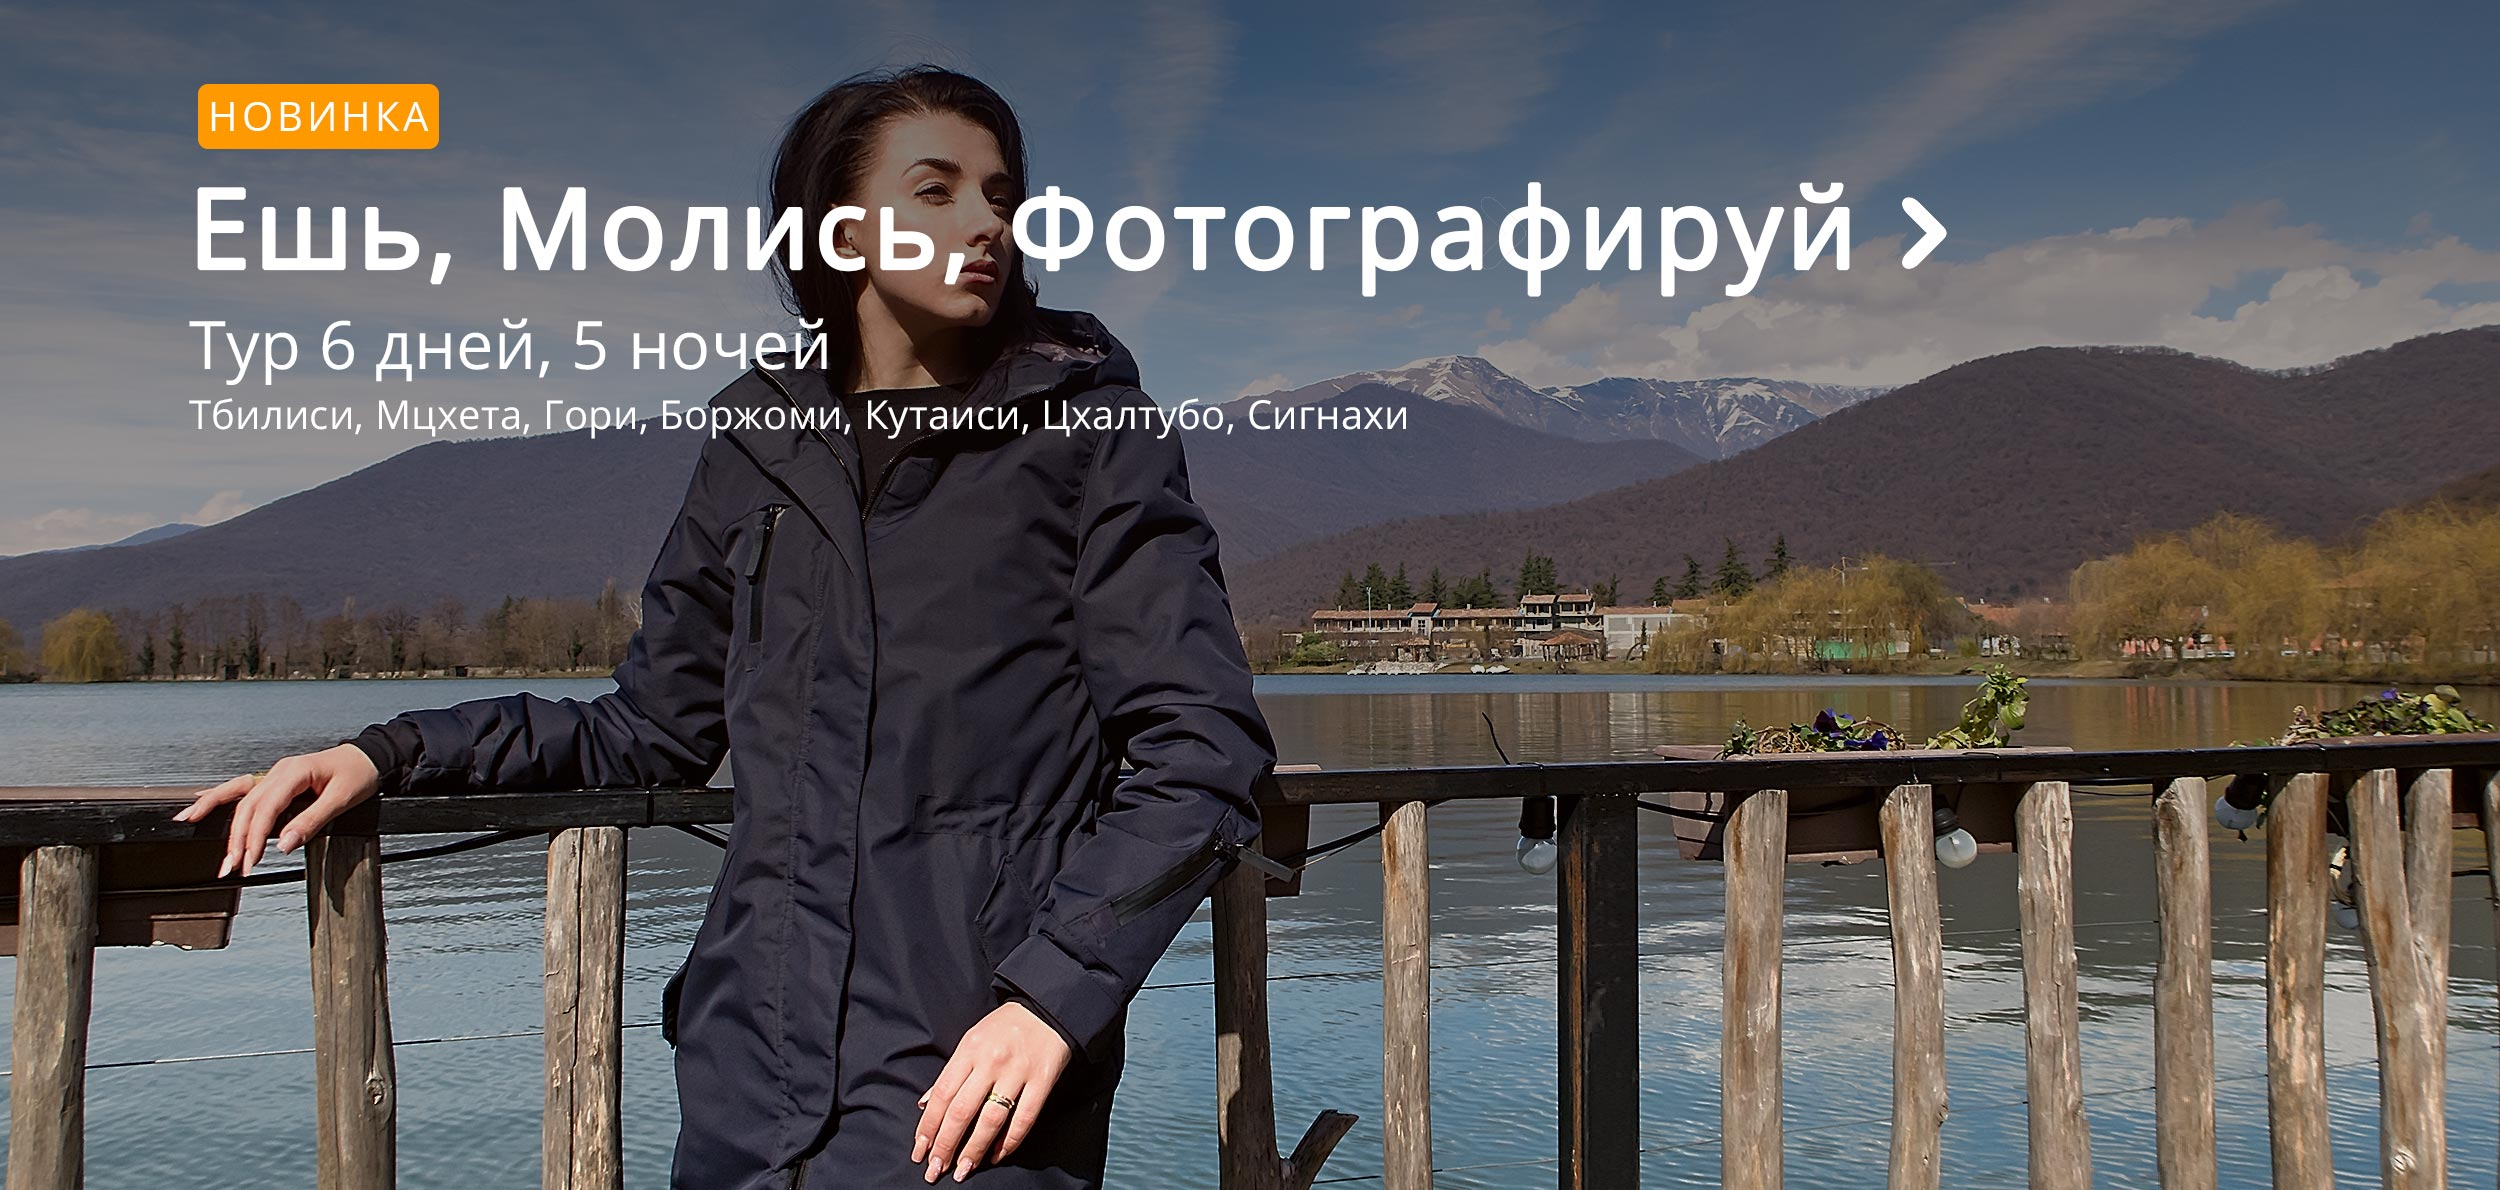 Тур Ешь, Молись, Фотографируй NAMERANI